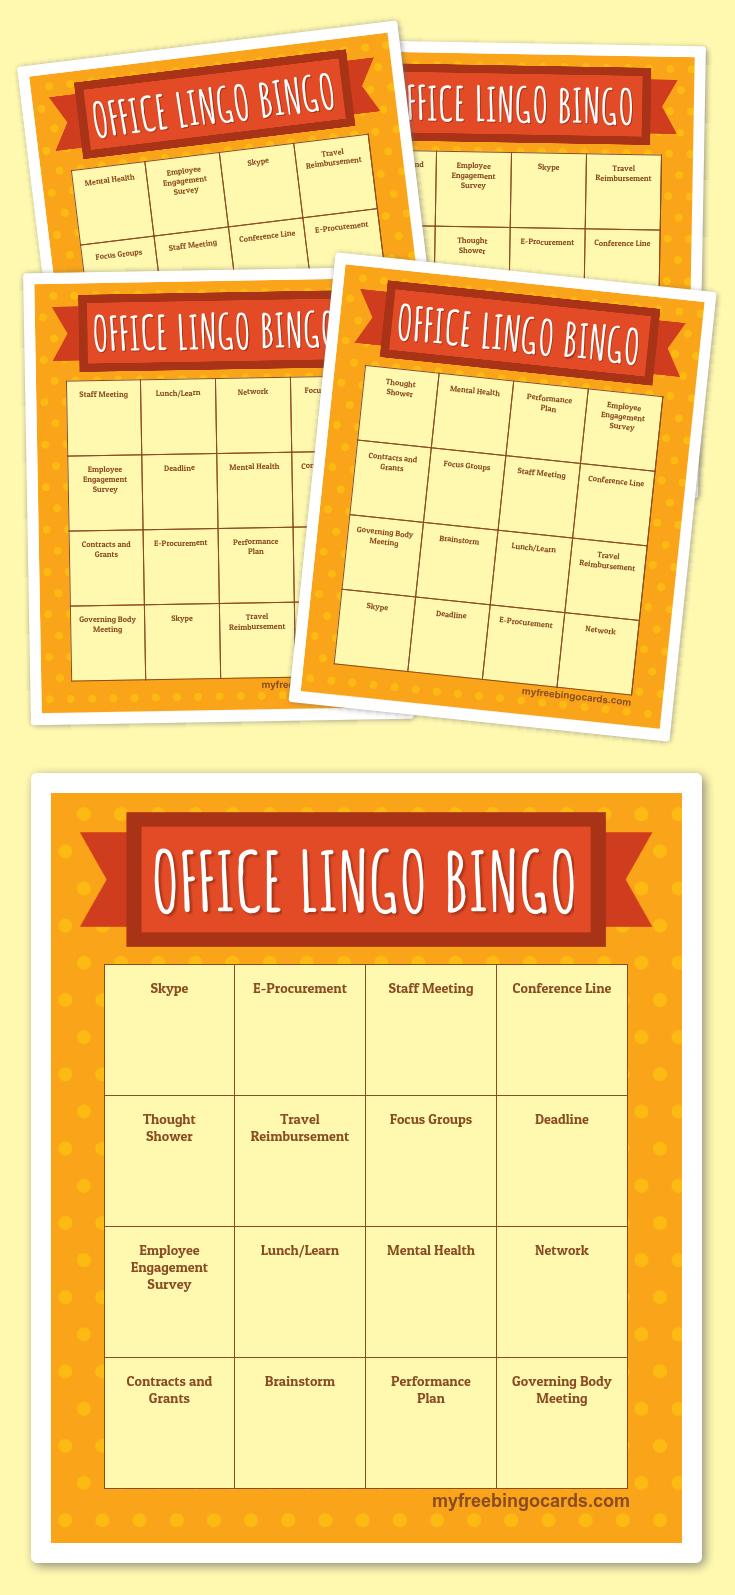 Office Lingo Bingo   Free Printable Bingo Cards, Bingo Cards